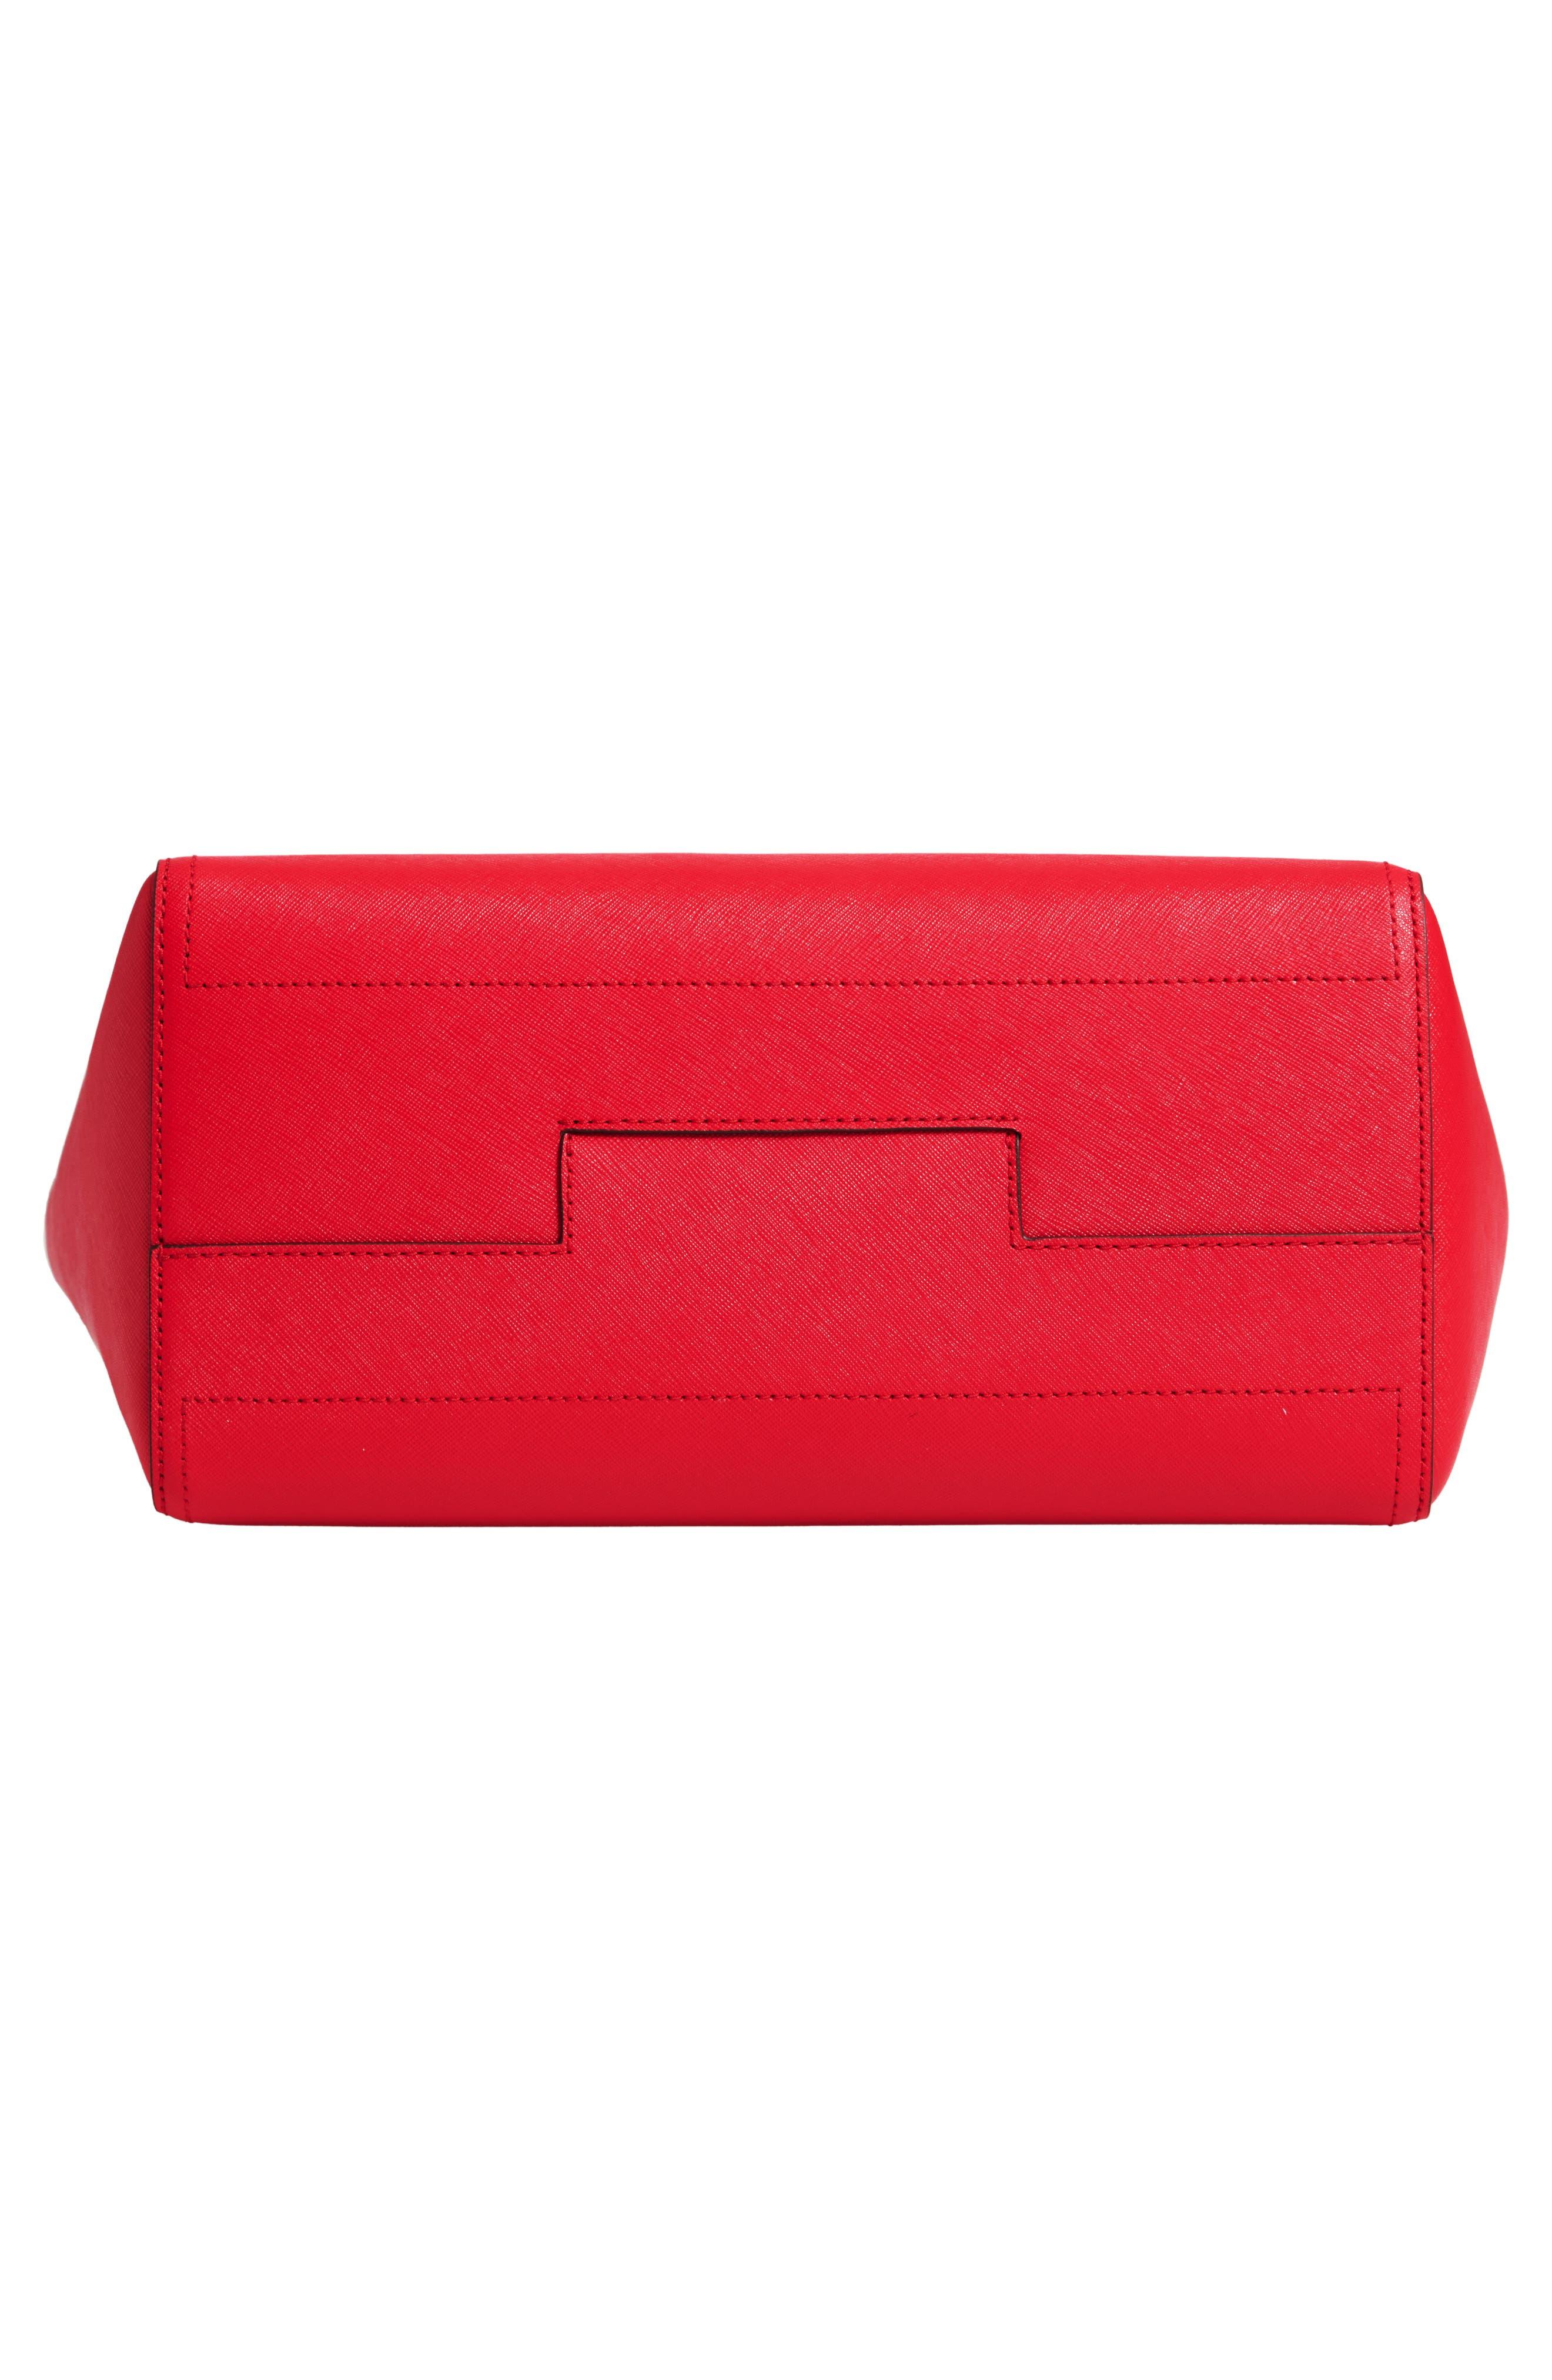 Small Robinson Leather Tote,                             Alternate thumbnail 6, color,                             BRILLIANT RED